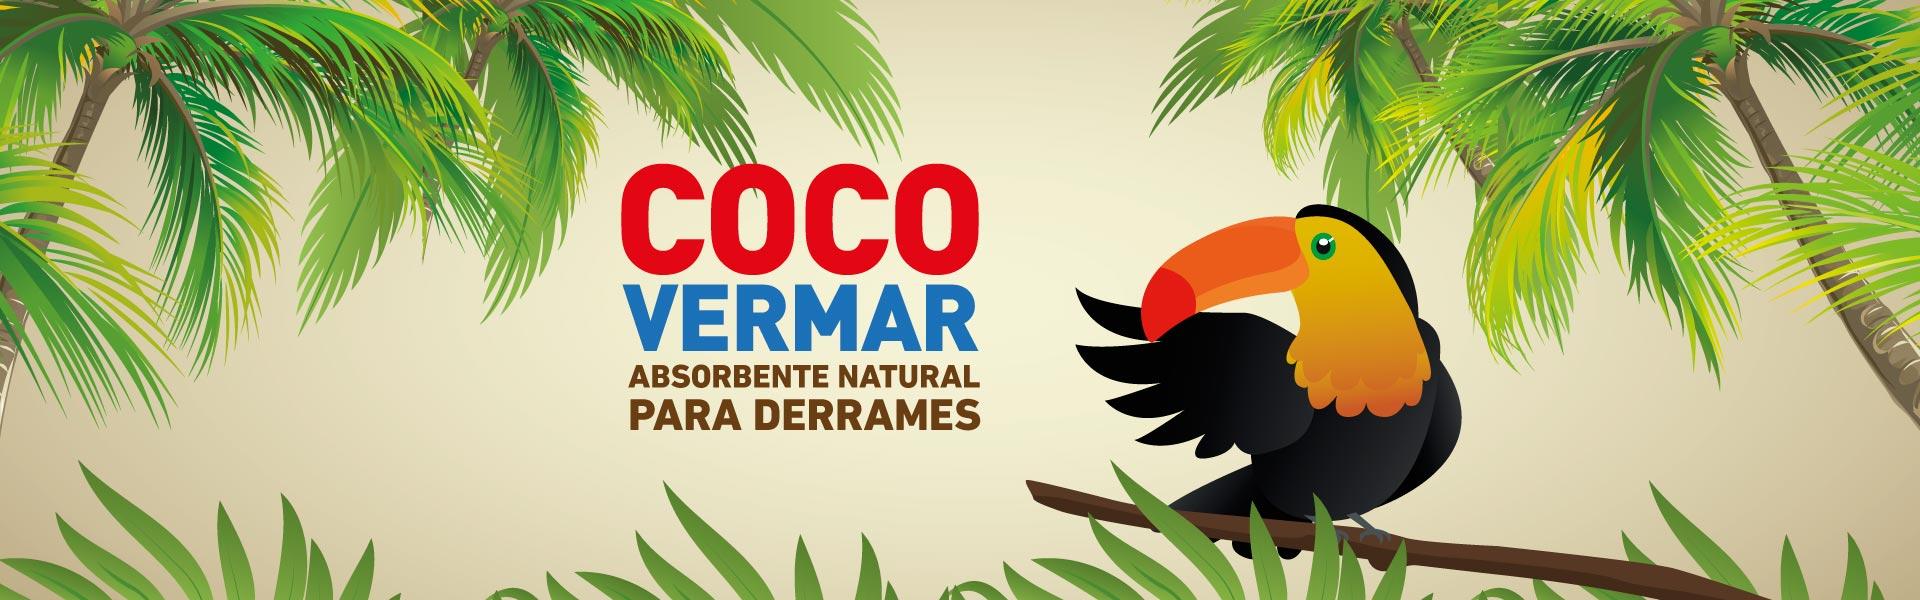 coco-vermar-absorbente-natural-para-derrames-banner-1